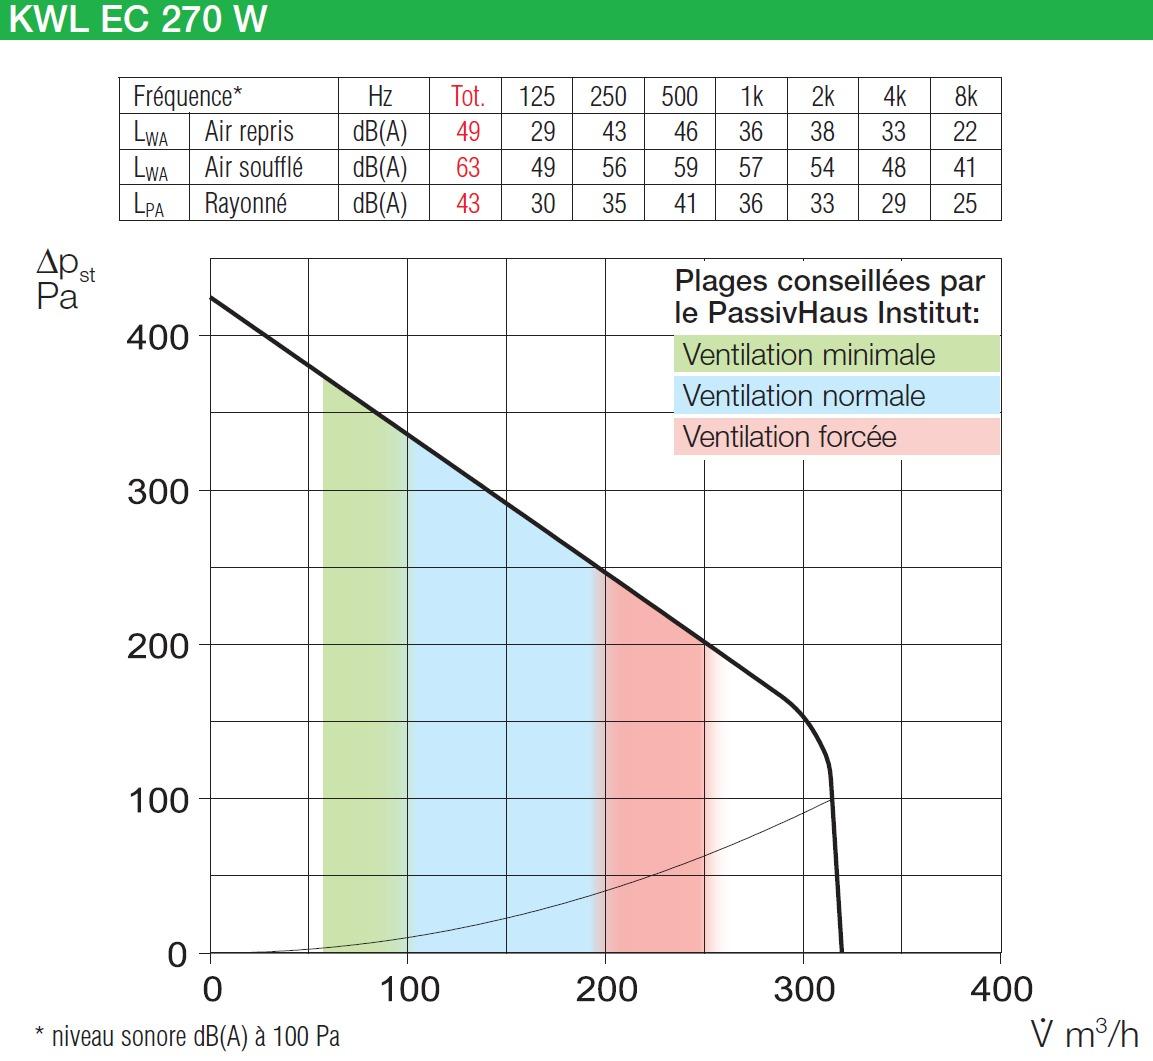 Vmc double flux kwl ec 270 w l easycontrols - Calcul vmc double flux ...